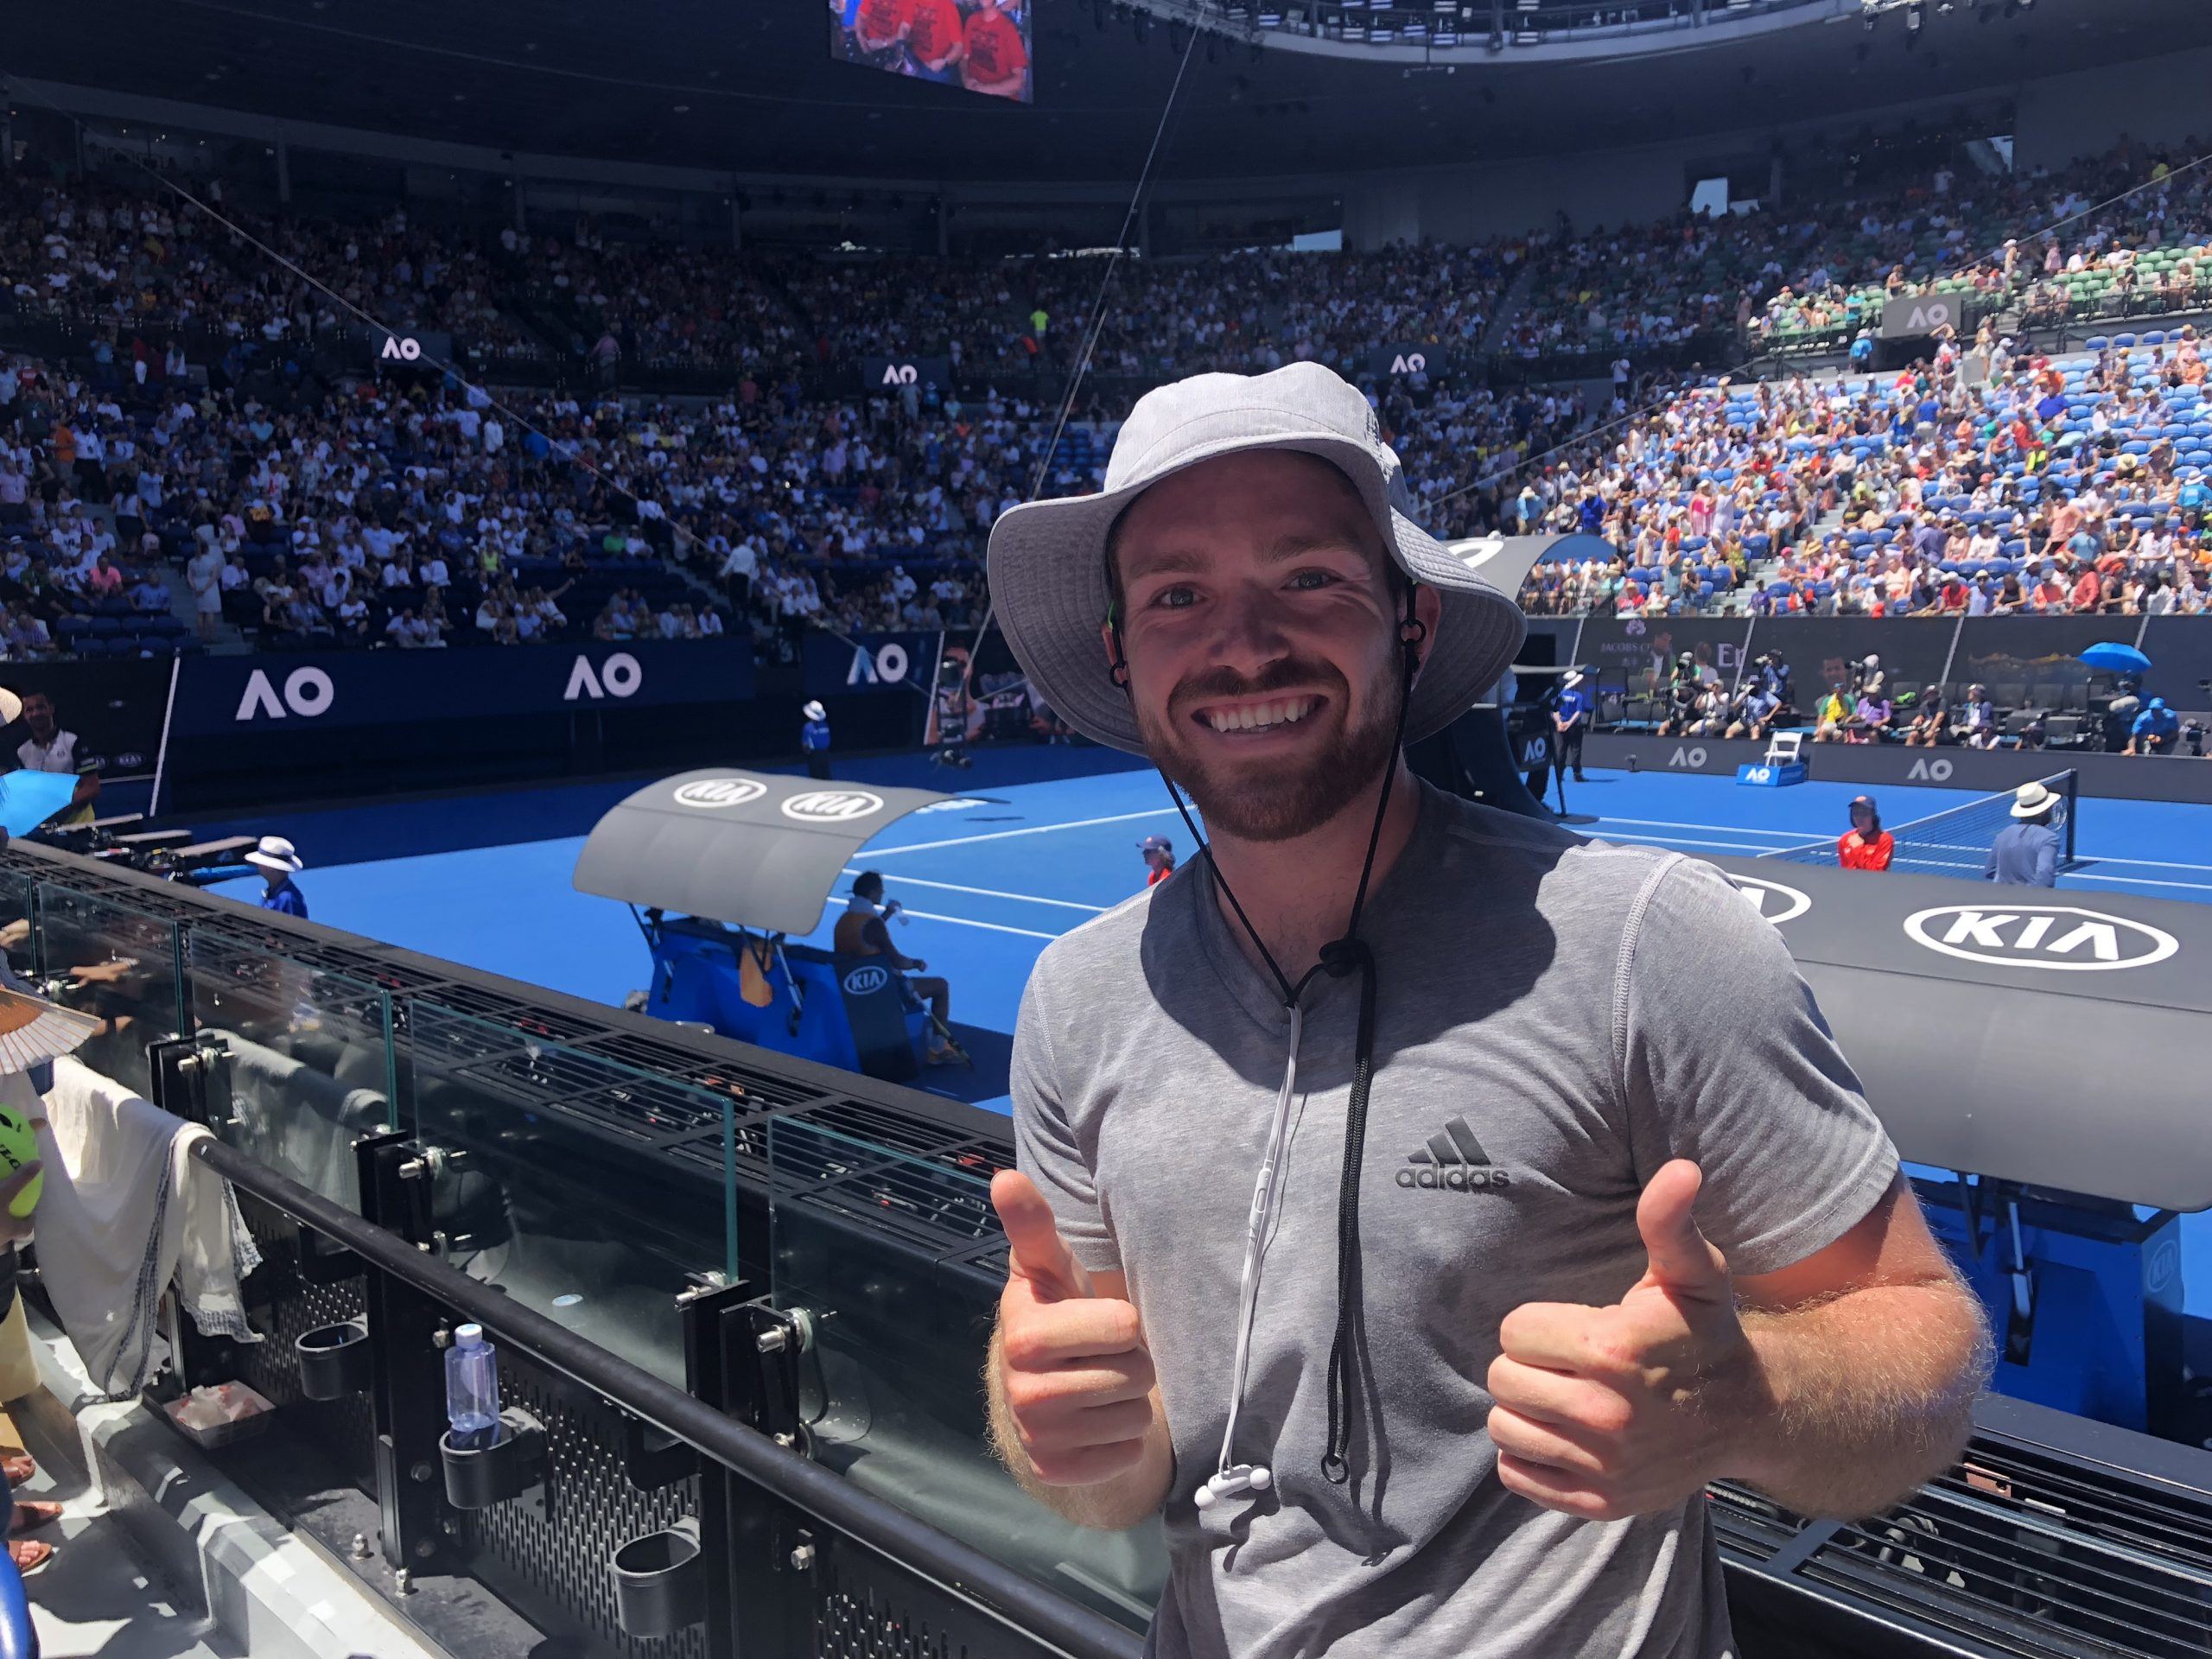 man at tennis tournament